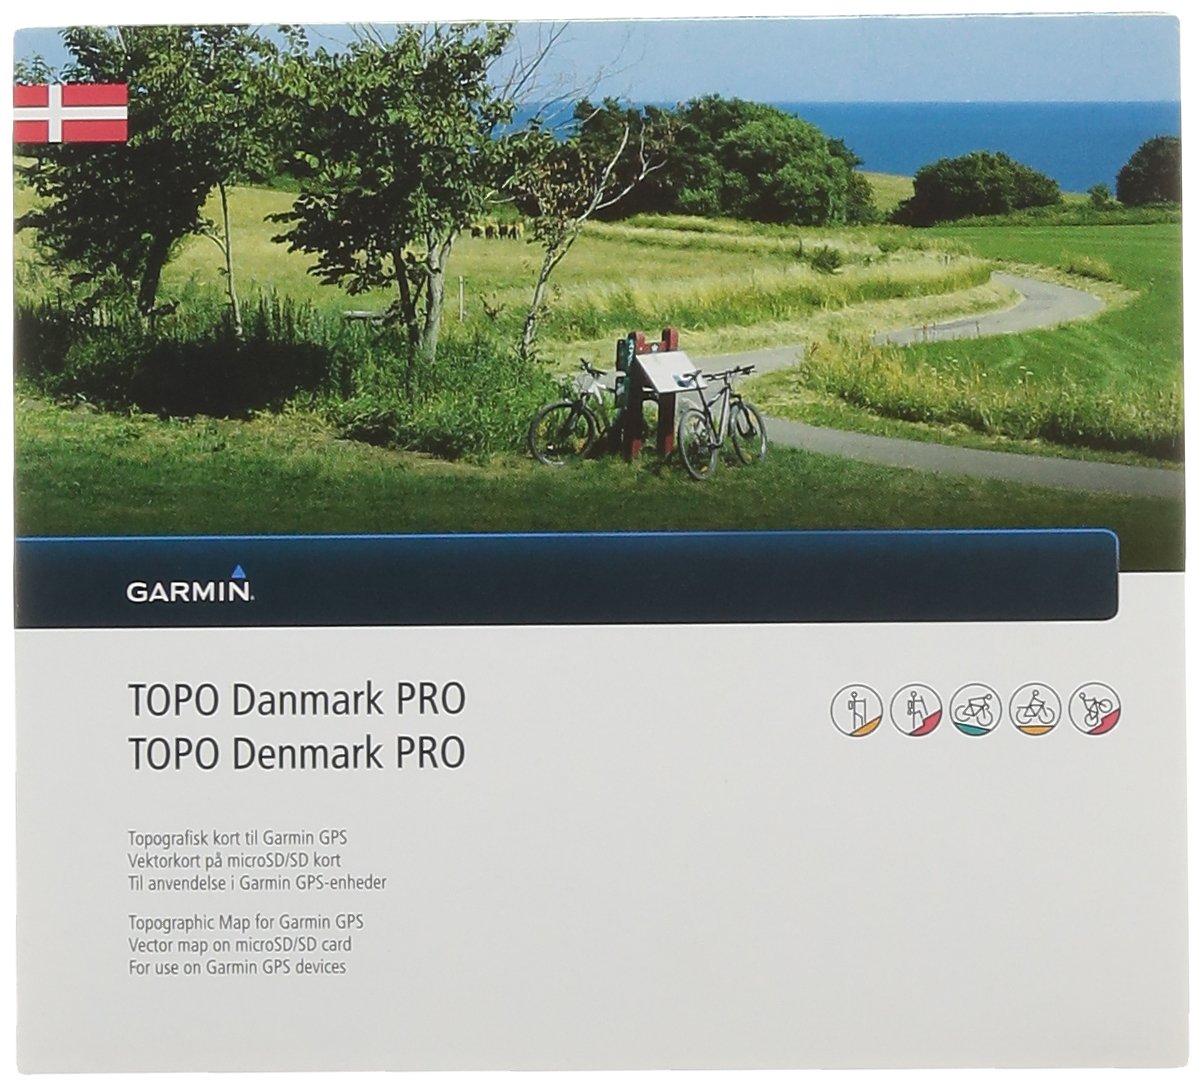 Garmin 64 Topo Denmark Pro 11836 01 Amazon Co Uk Sports Outdoors